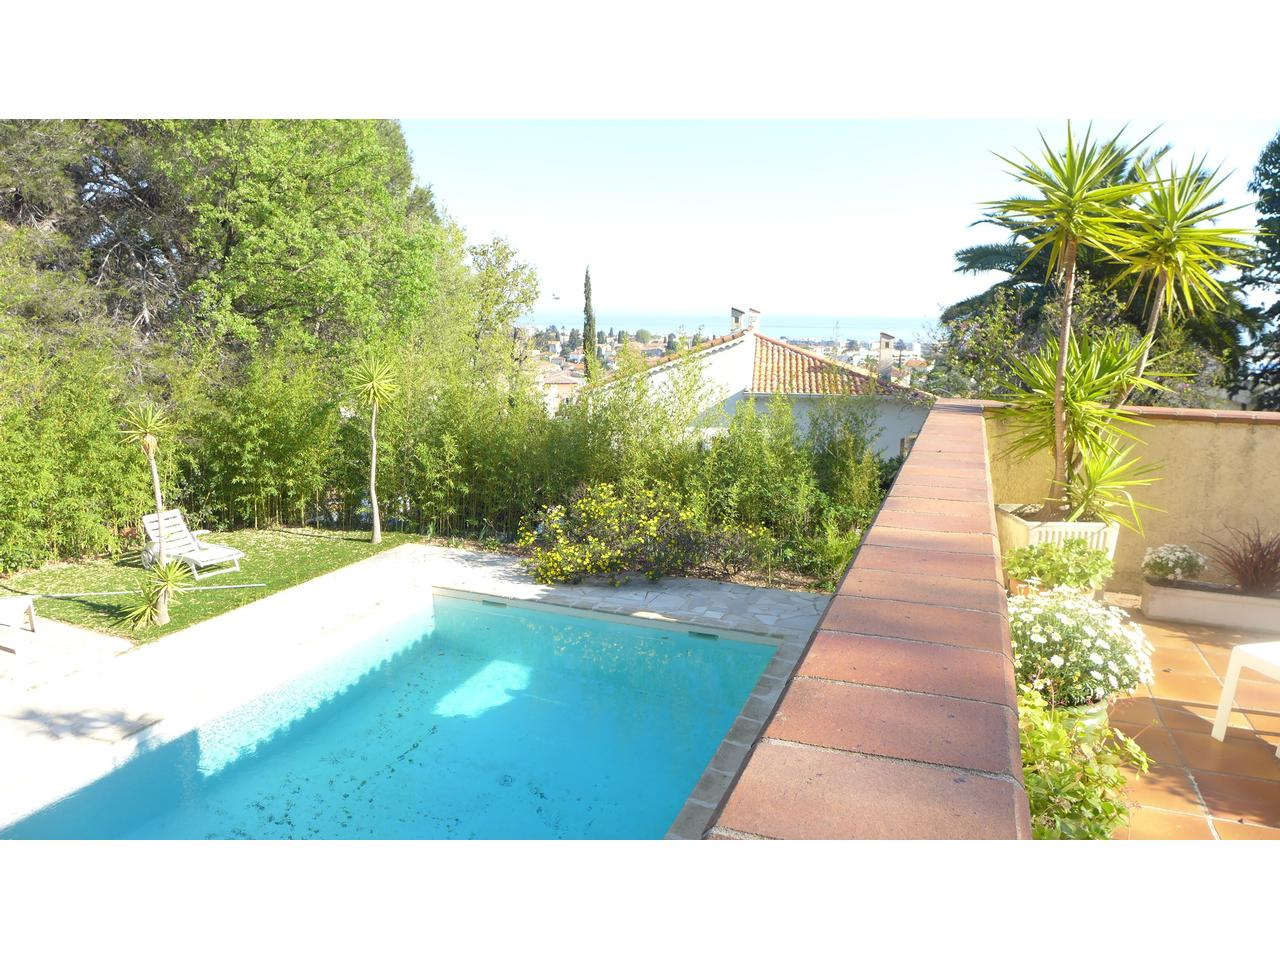 Immobilier nice vue mer maison cagnes sur mer maison a vendre avec vue mer terrain plat avec piscine - Piscine pente terrain nice ...